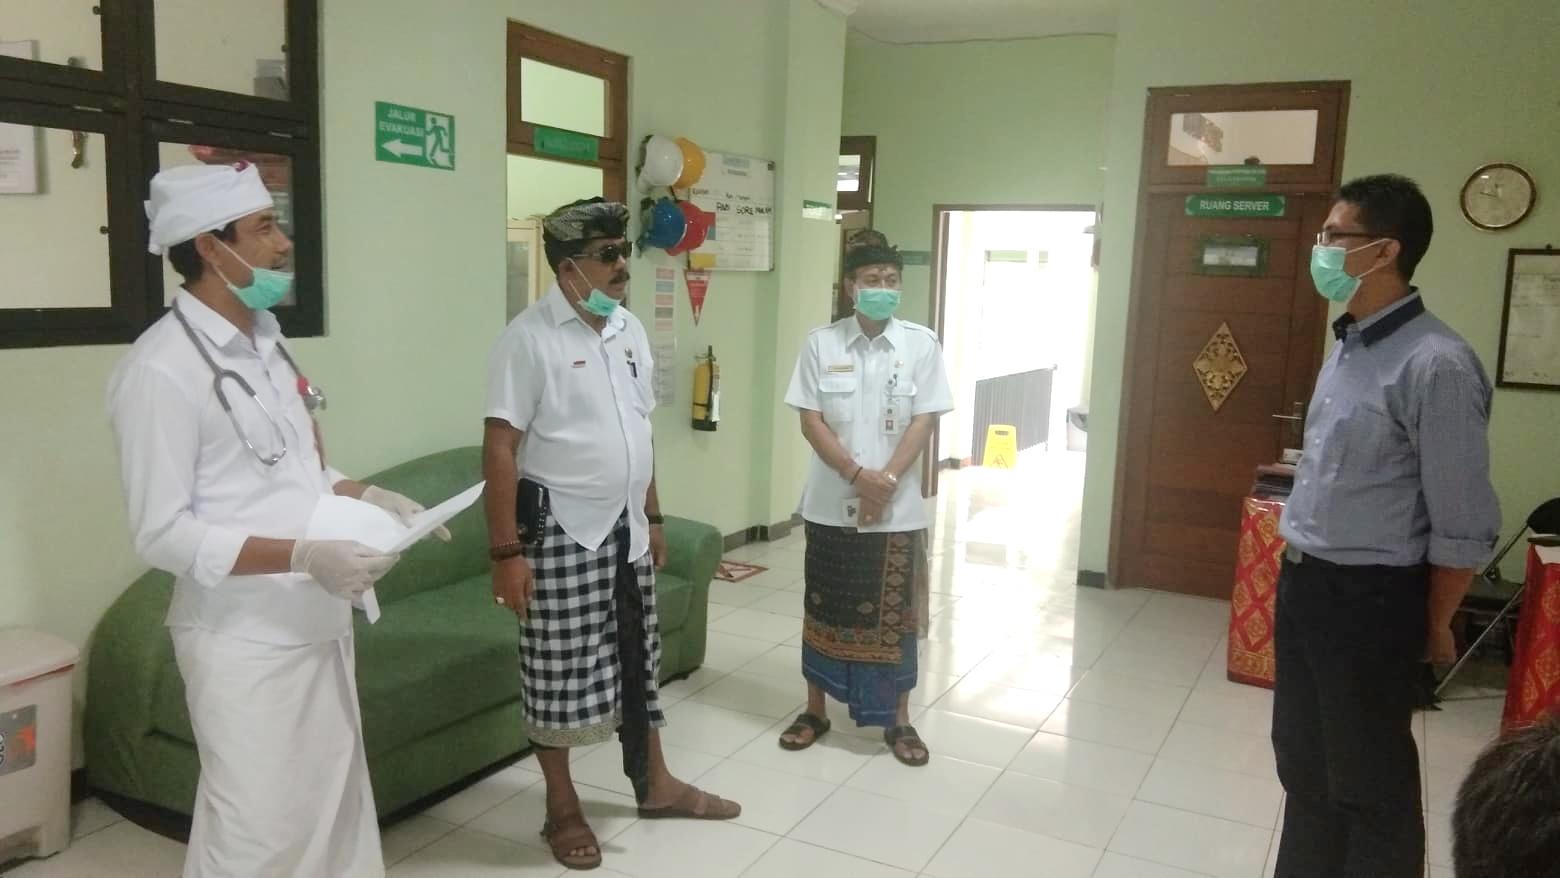 WABUP Kasta bersama Direktur RSUD Klungkung, dr. I Nyoman Kesuma meninjau UTD PMI RSUD Klungkung, Kamis (2/4/2020). Foto: baw